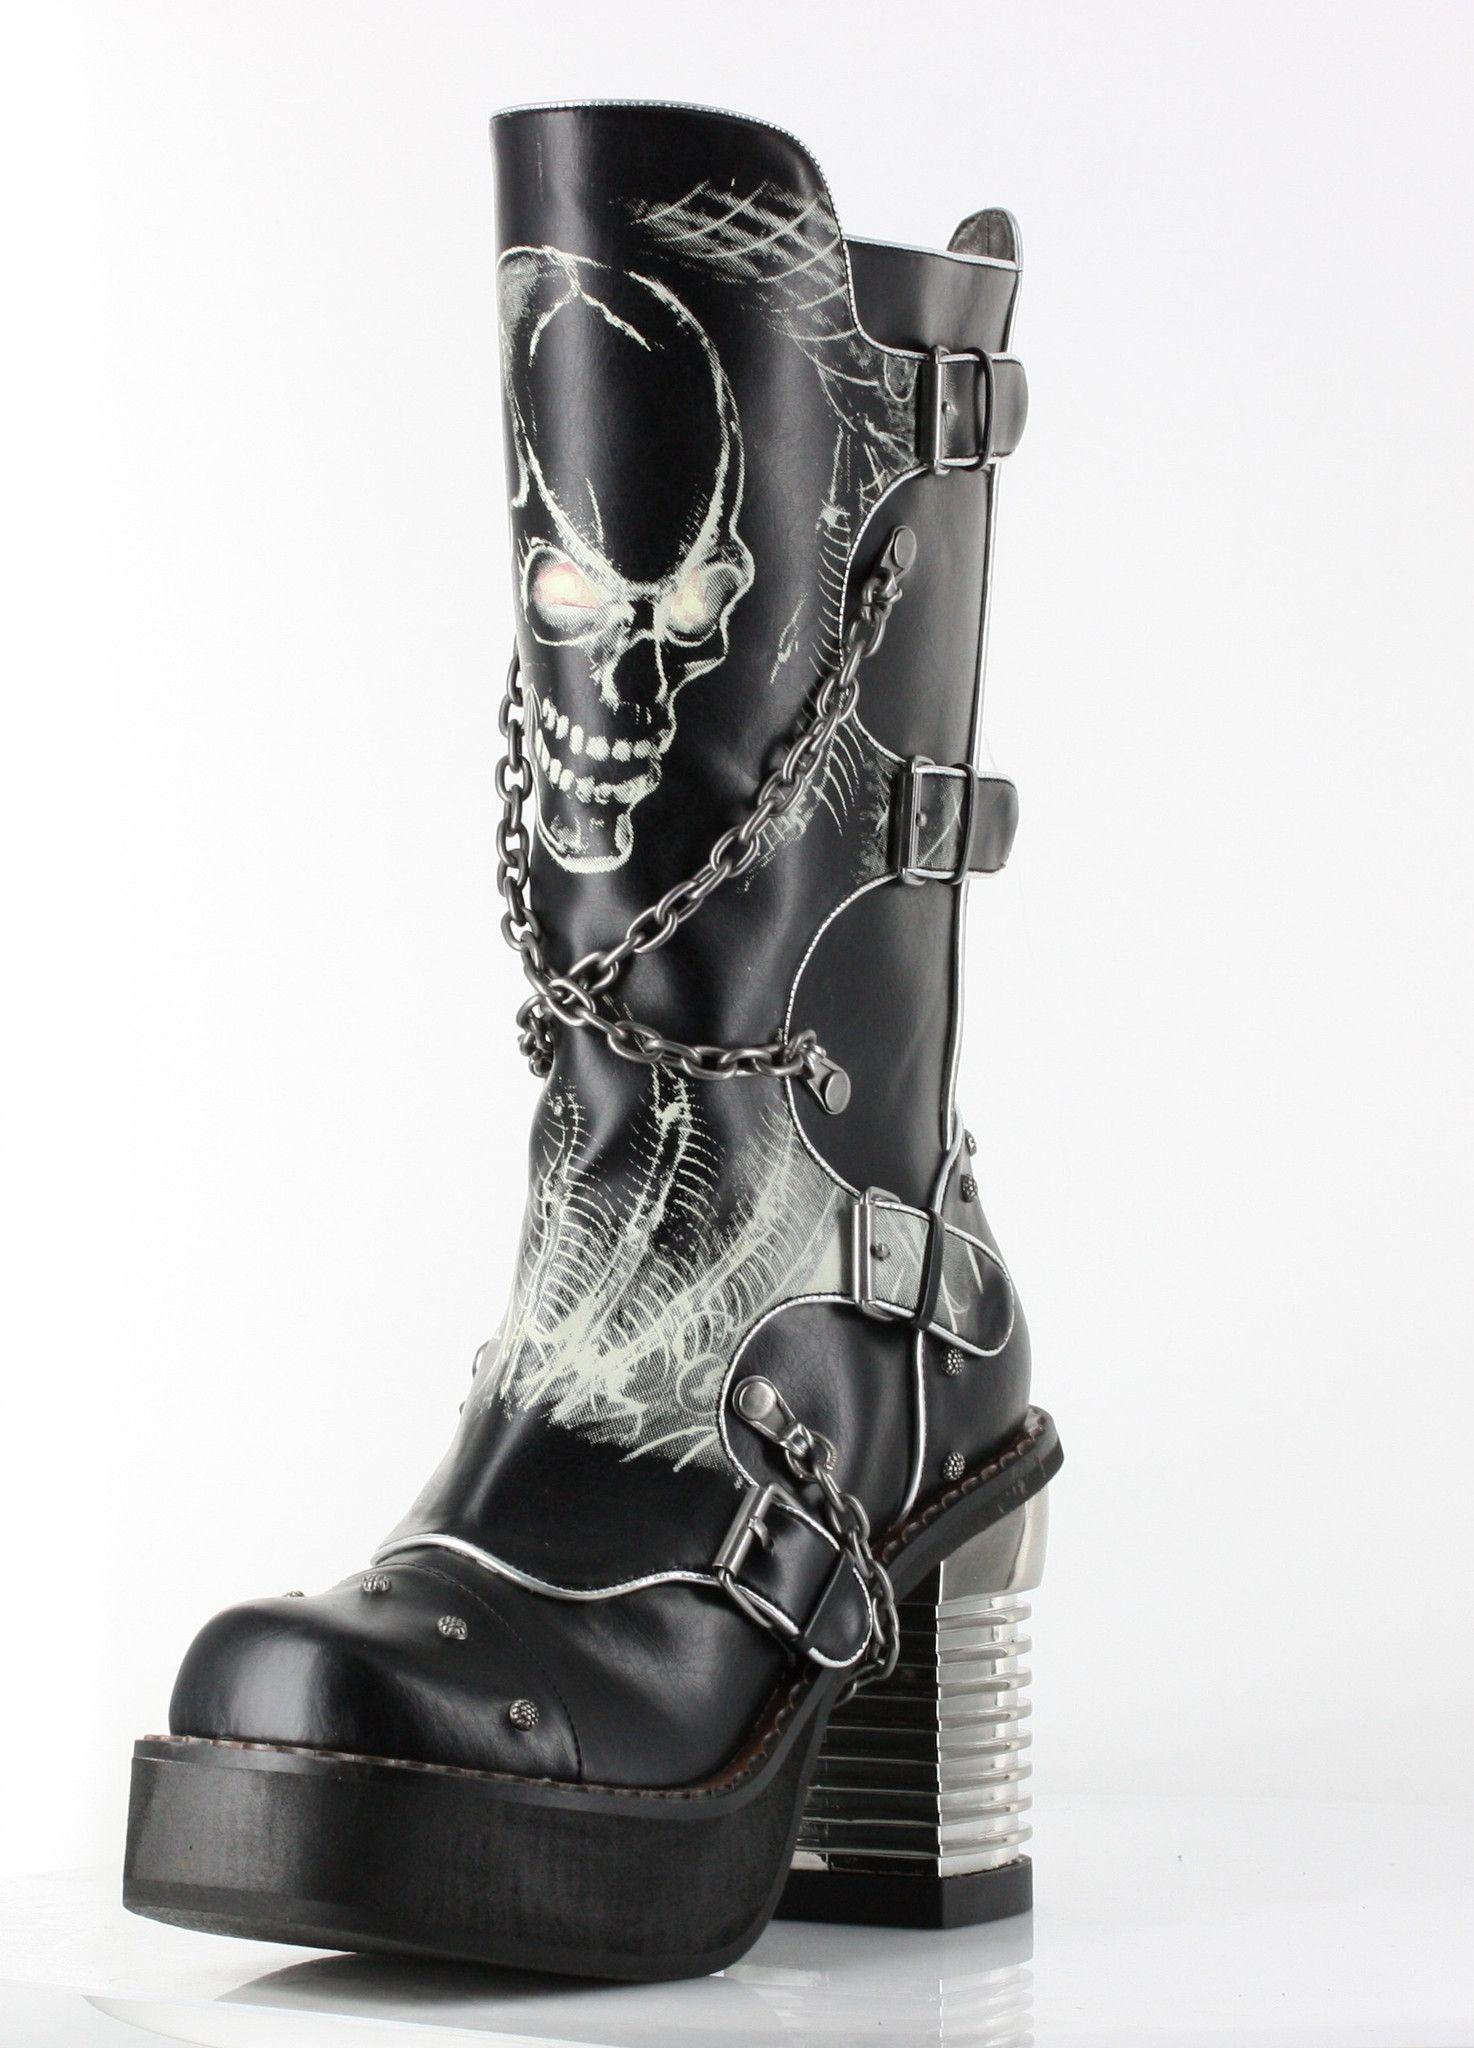 "db54452691a Black PU knee high punk boots w  crisscrossed biker chains. 3.5″ chunky  steampunk heel w  adjustable side buckle   inner zipper. Skull   bone ""glow  in dark"" ..."